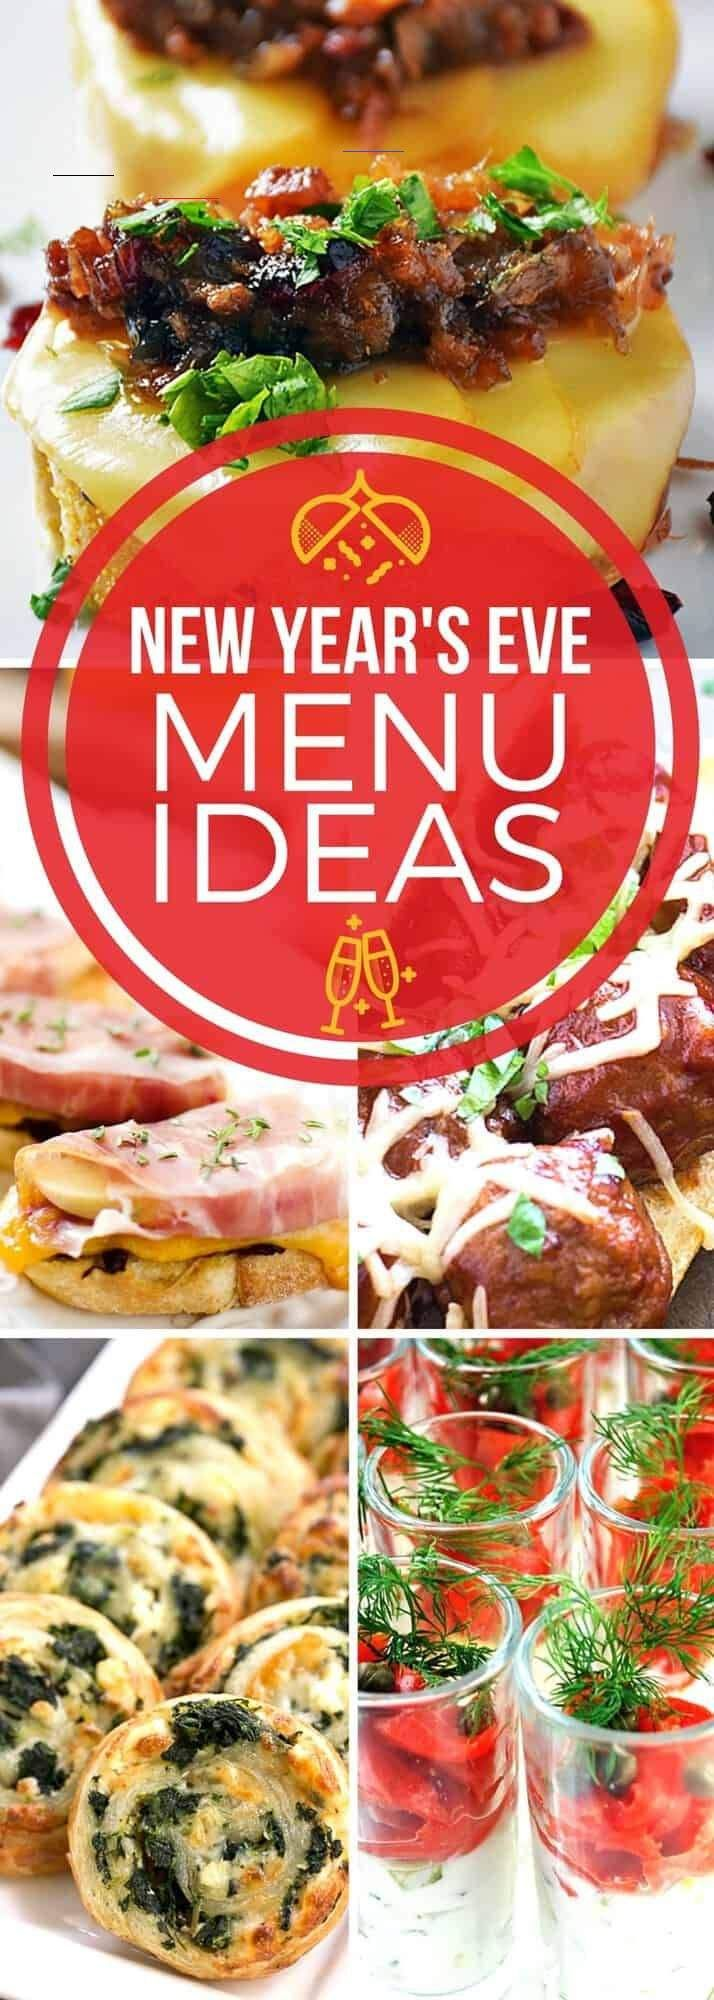 newyearsevepartyideasfood in 2020 Silvester essen